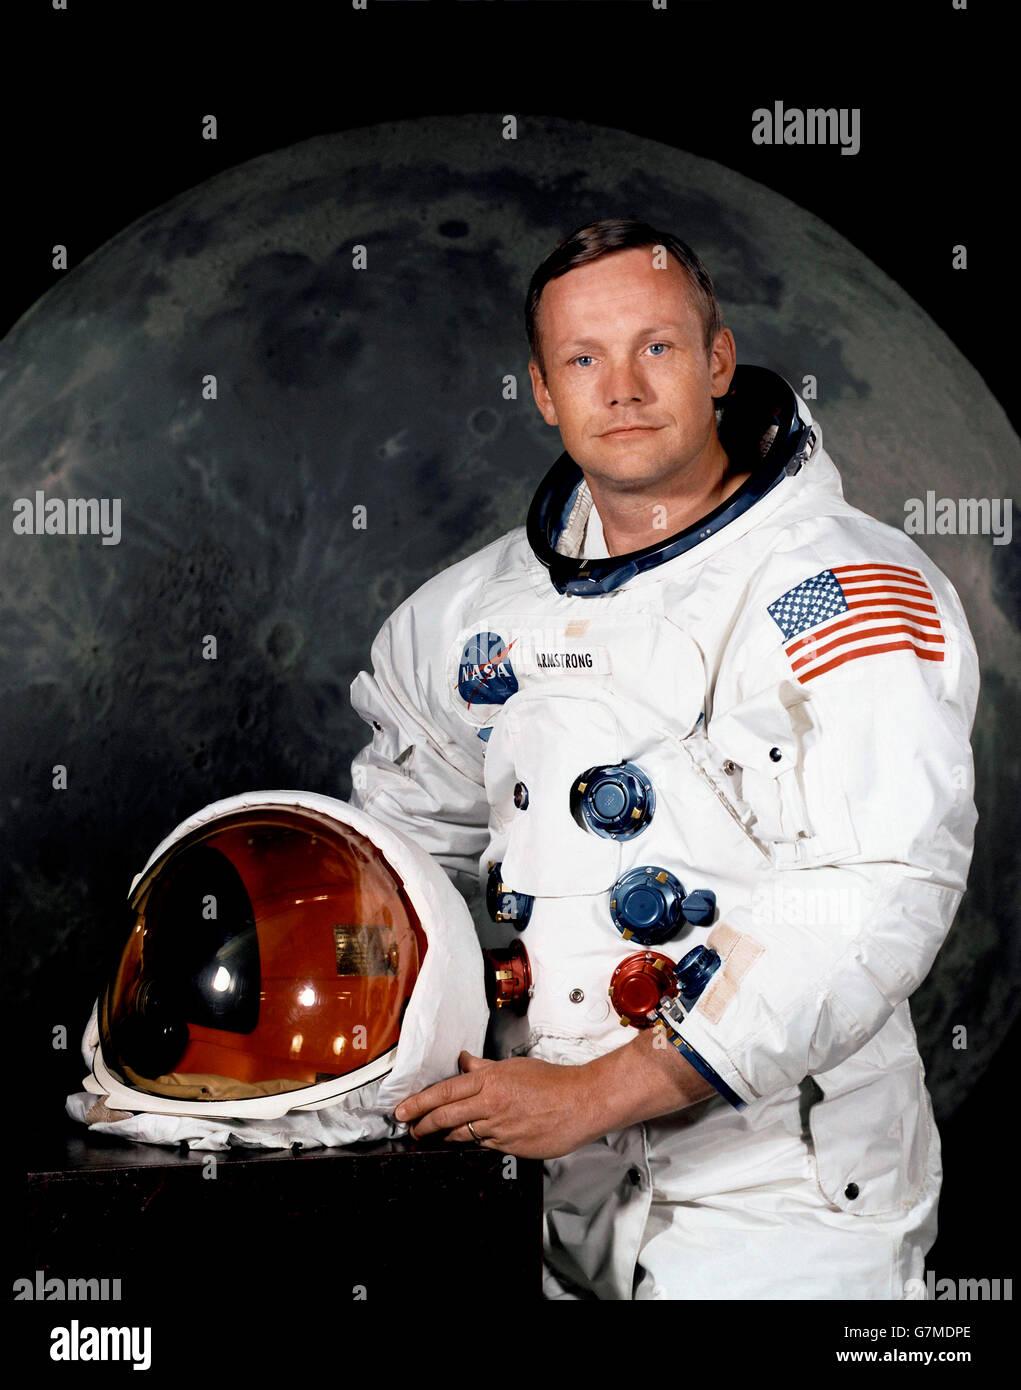 Neil Armstrong, Astronaut. Offizielle NASA-Porträt des Neil A. Armstrong, Kommandant der Apollo 11 Mondlandung und der erste Mensch auf dem Mond spazieren gehen. Stockfoto